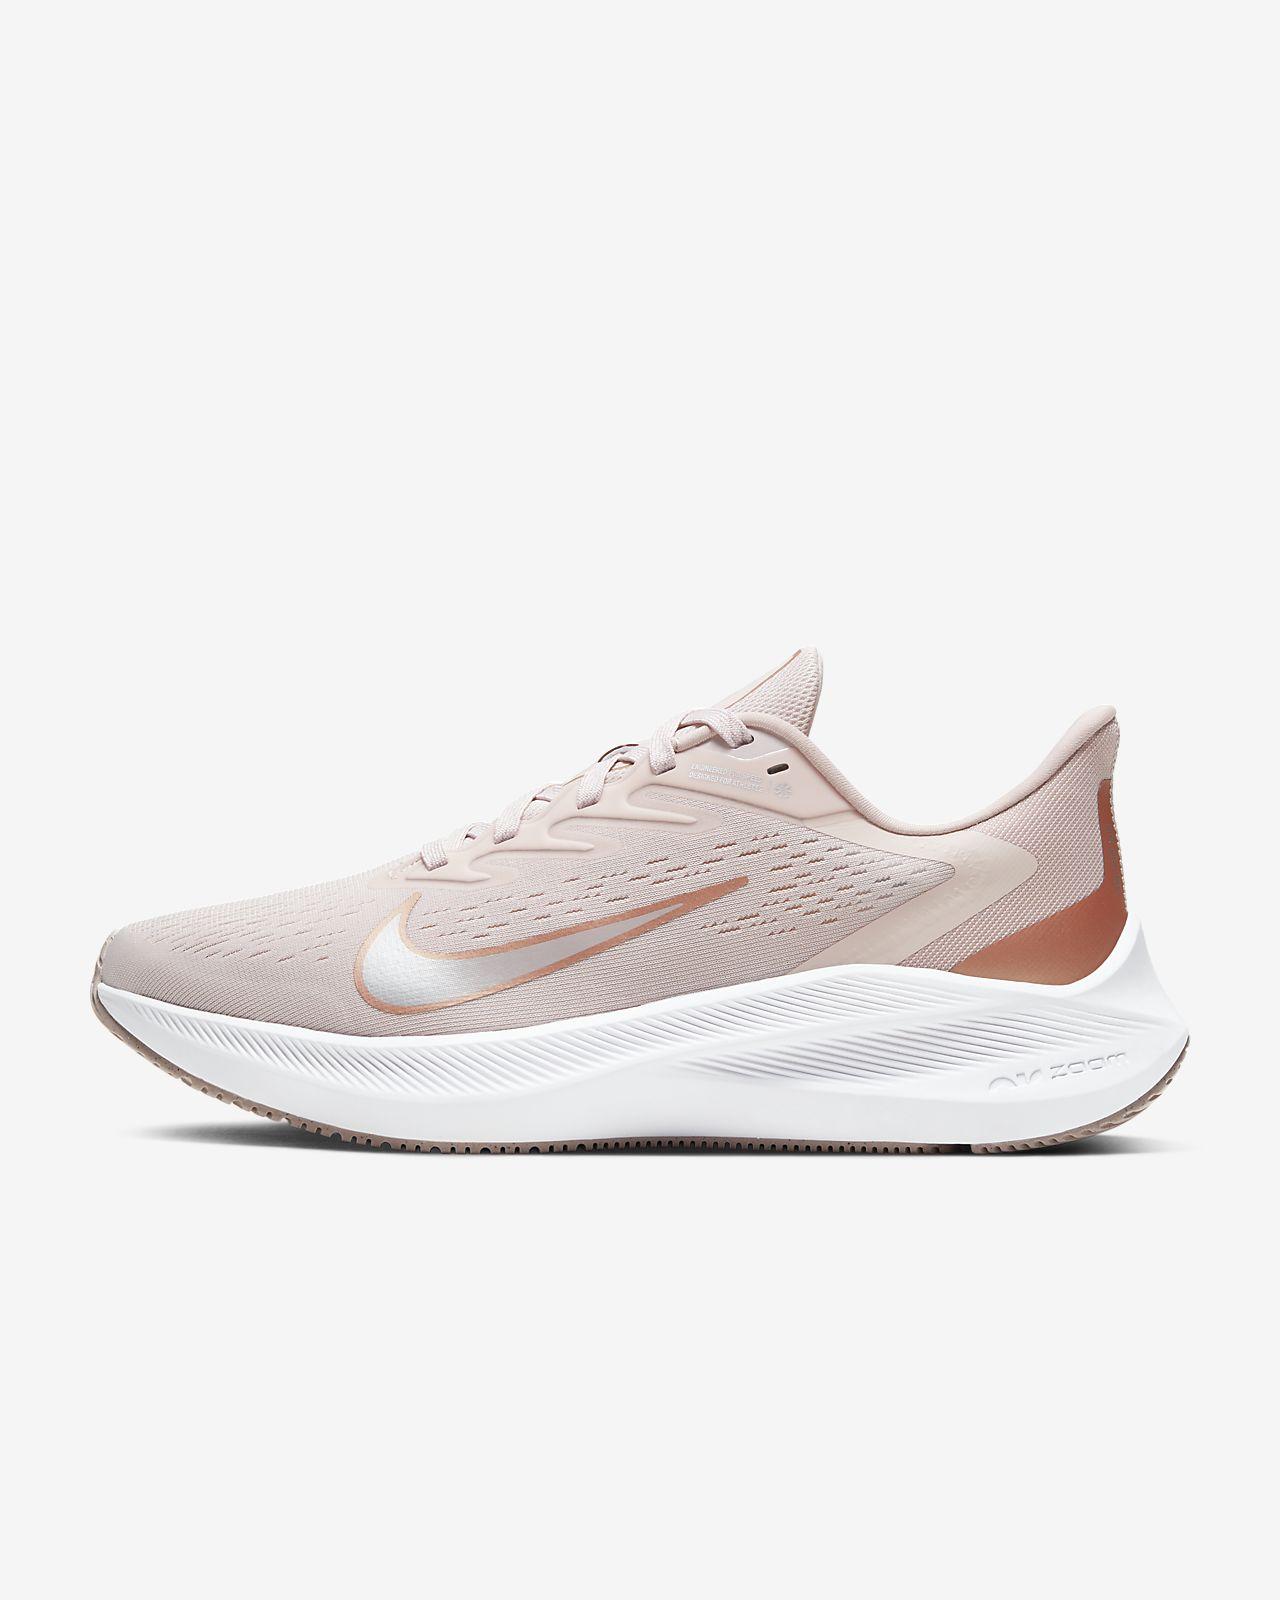 Nike Air Zoom Winflo 7 Women's Running Shoe